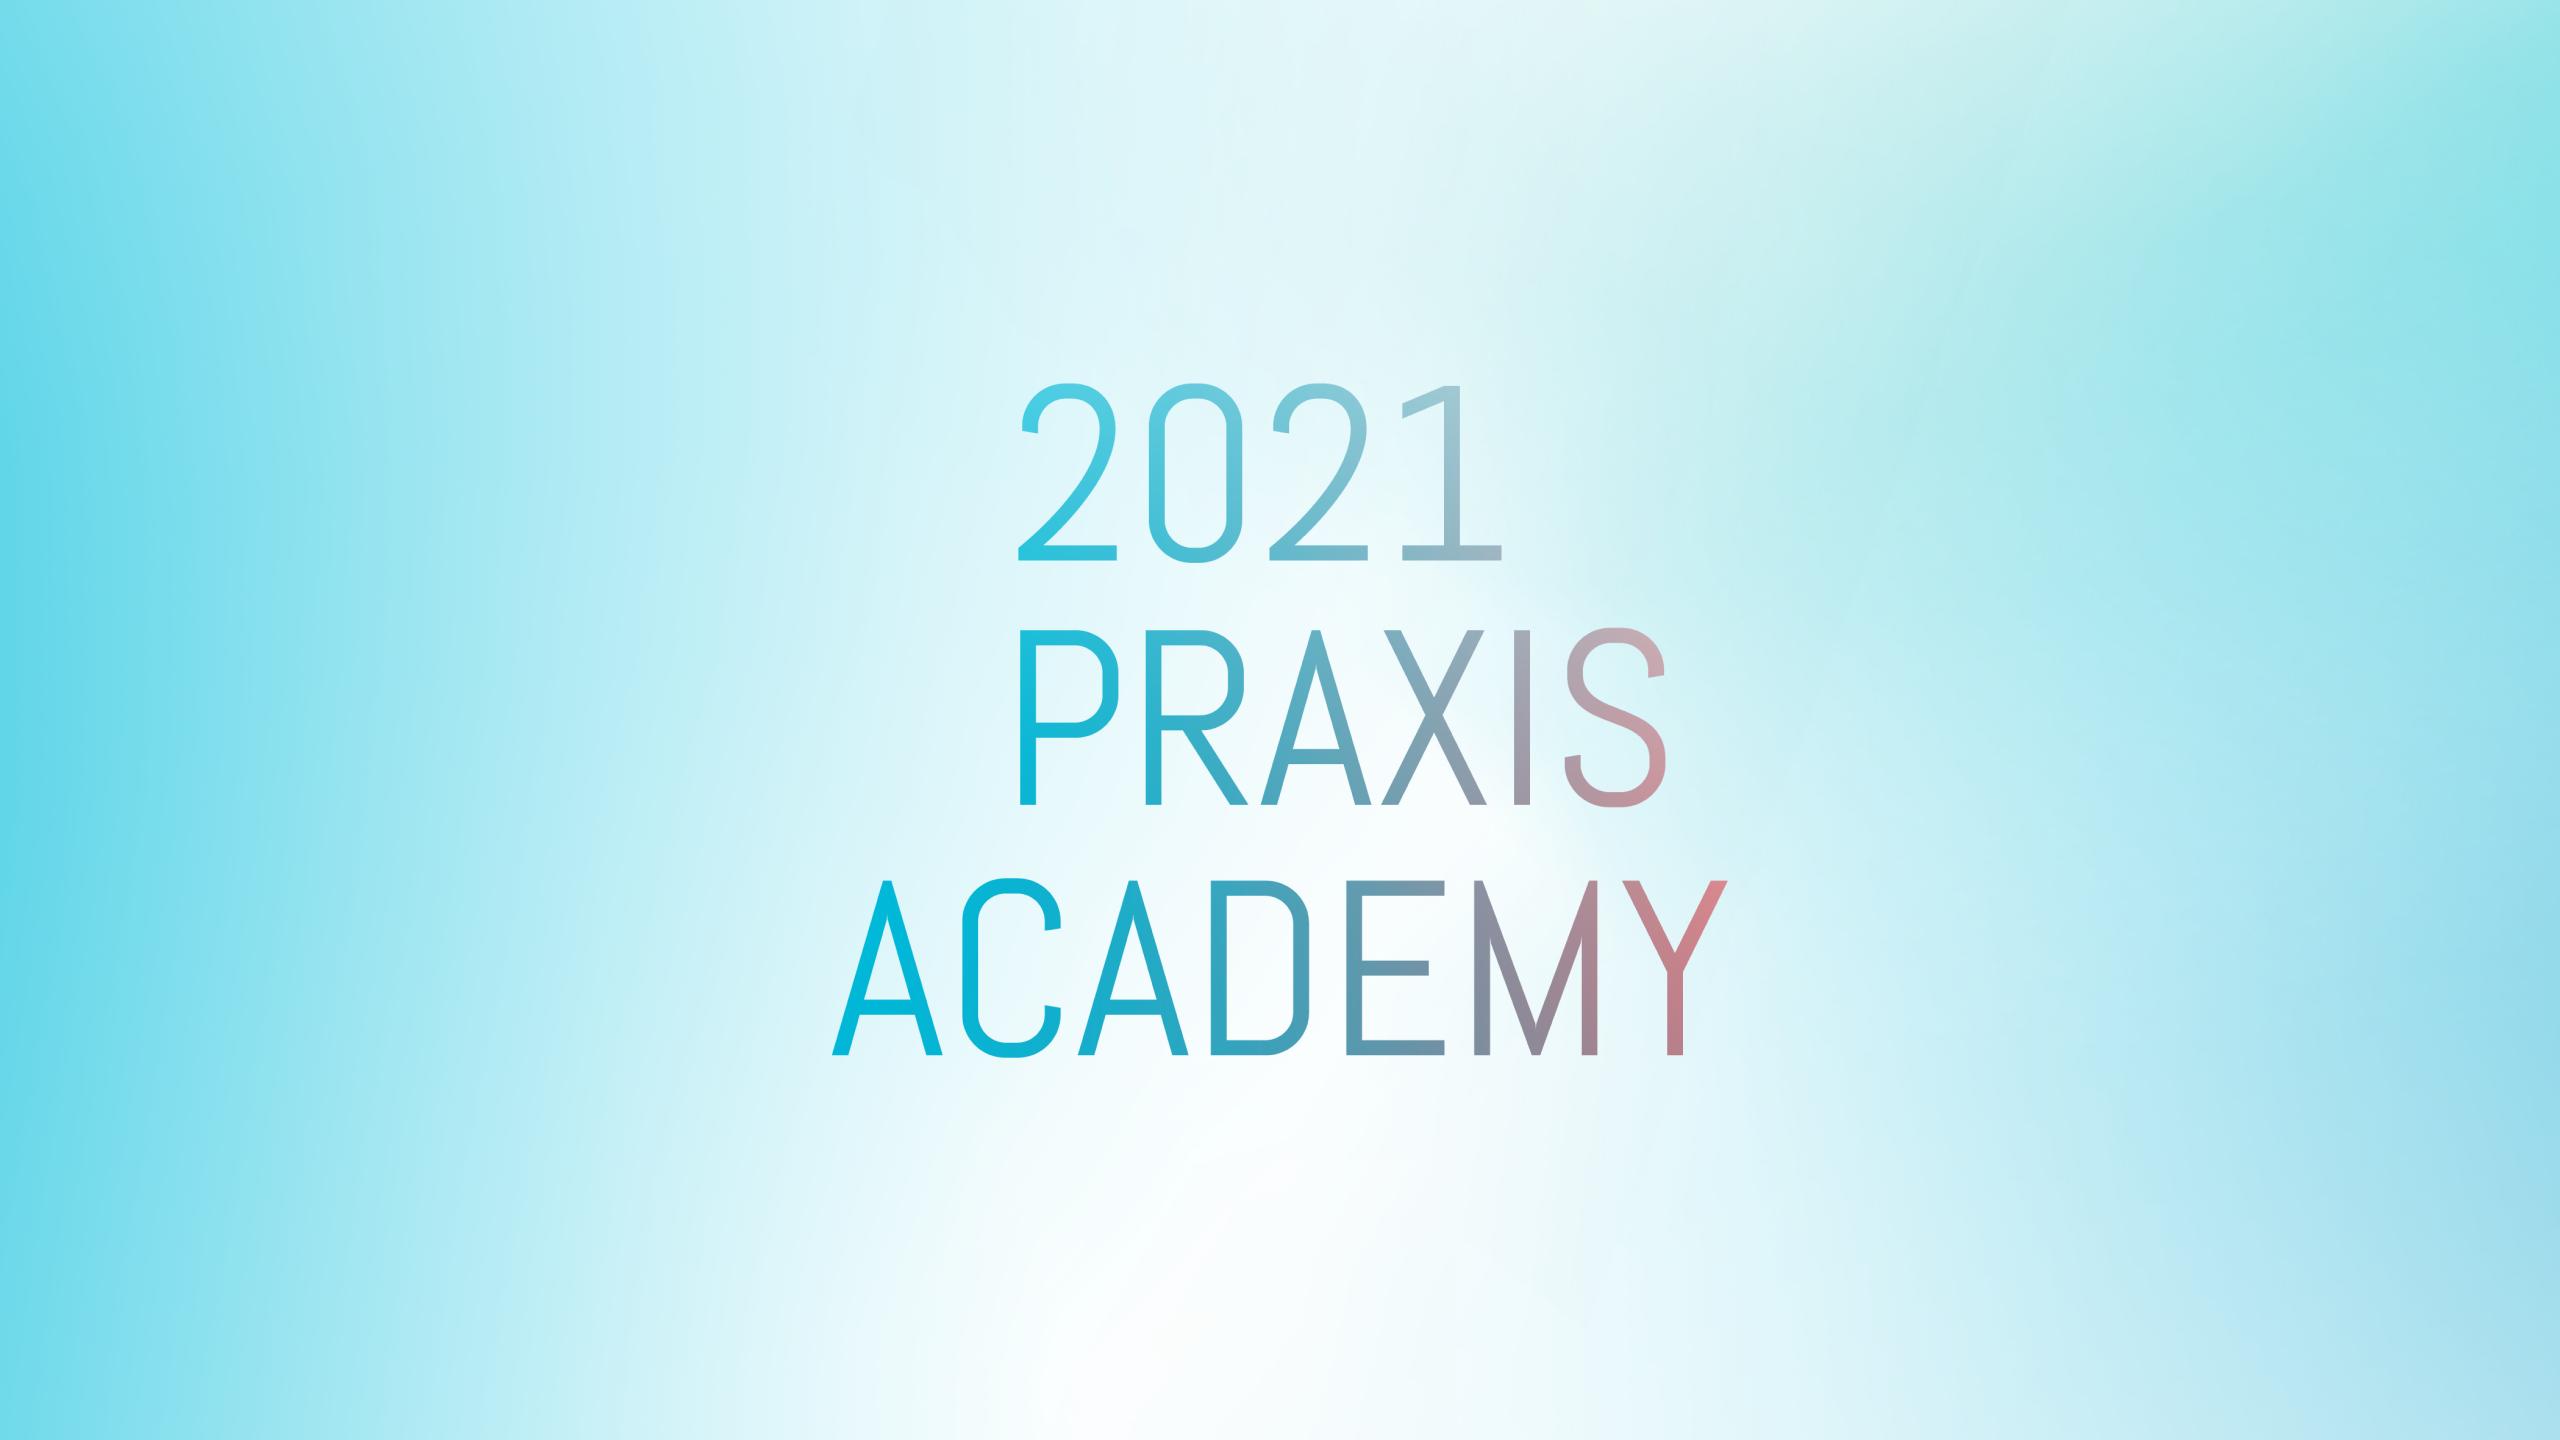 2021 Praxis Academy serves its biggest cohort yet